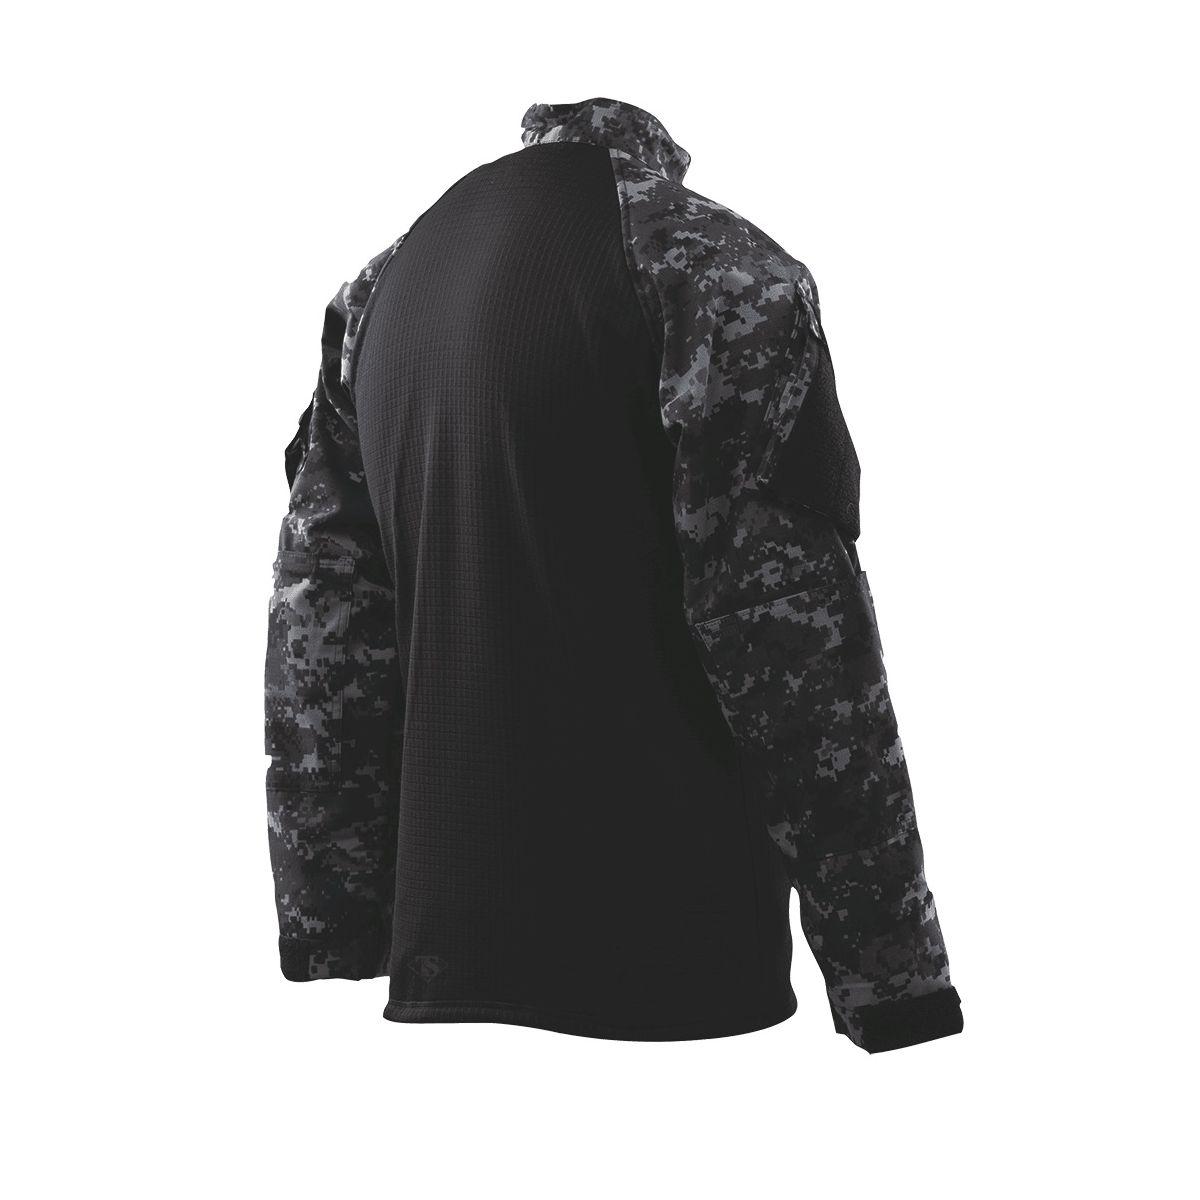 Košile taktická 1/4 zip COLD WEATHER DIGITAL URBAN TRU-SPEC 25940 L-11